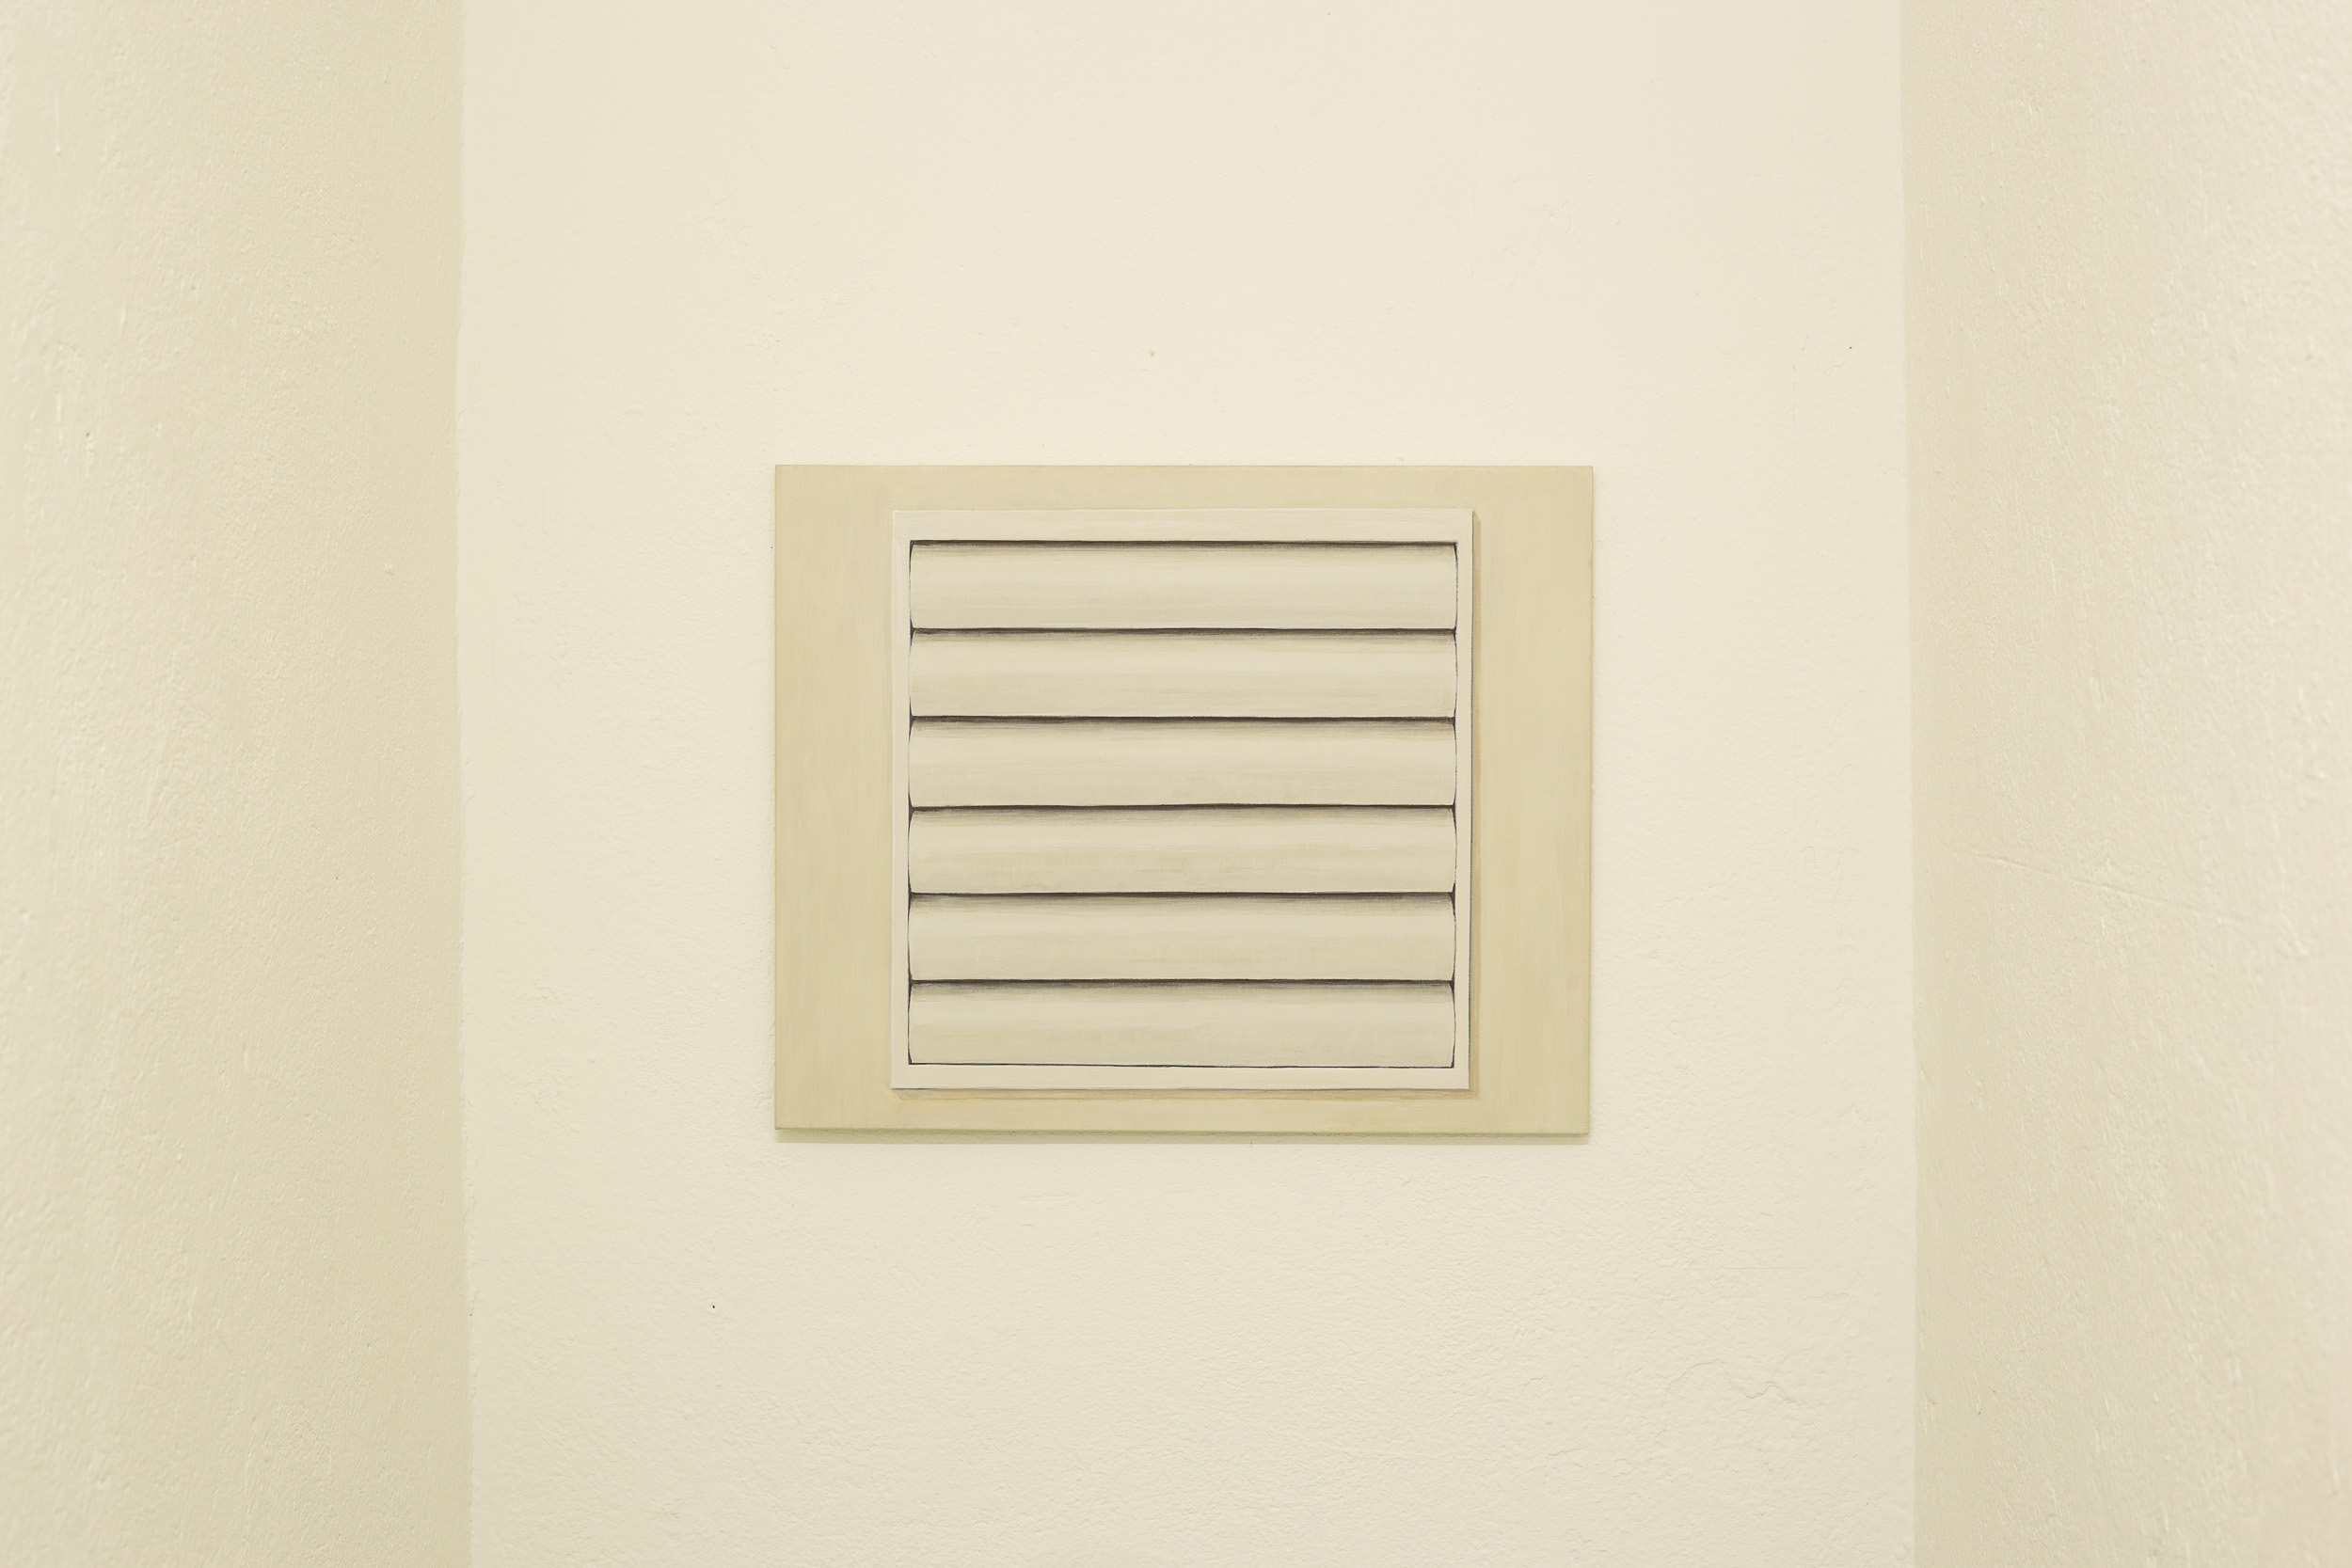 Christoph Hänsli,  Ventilation Grille , 2008, egg tempera and acrylic on canvas, 45 x 55 cm  Photo: Kilian Bannwart